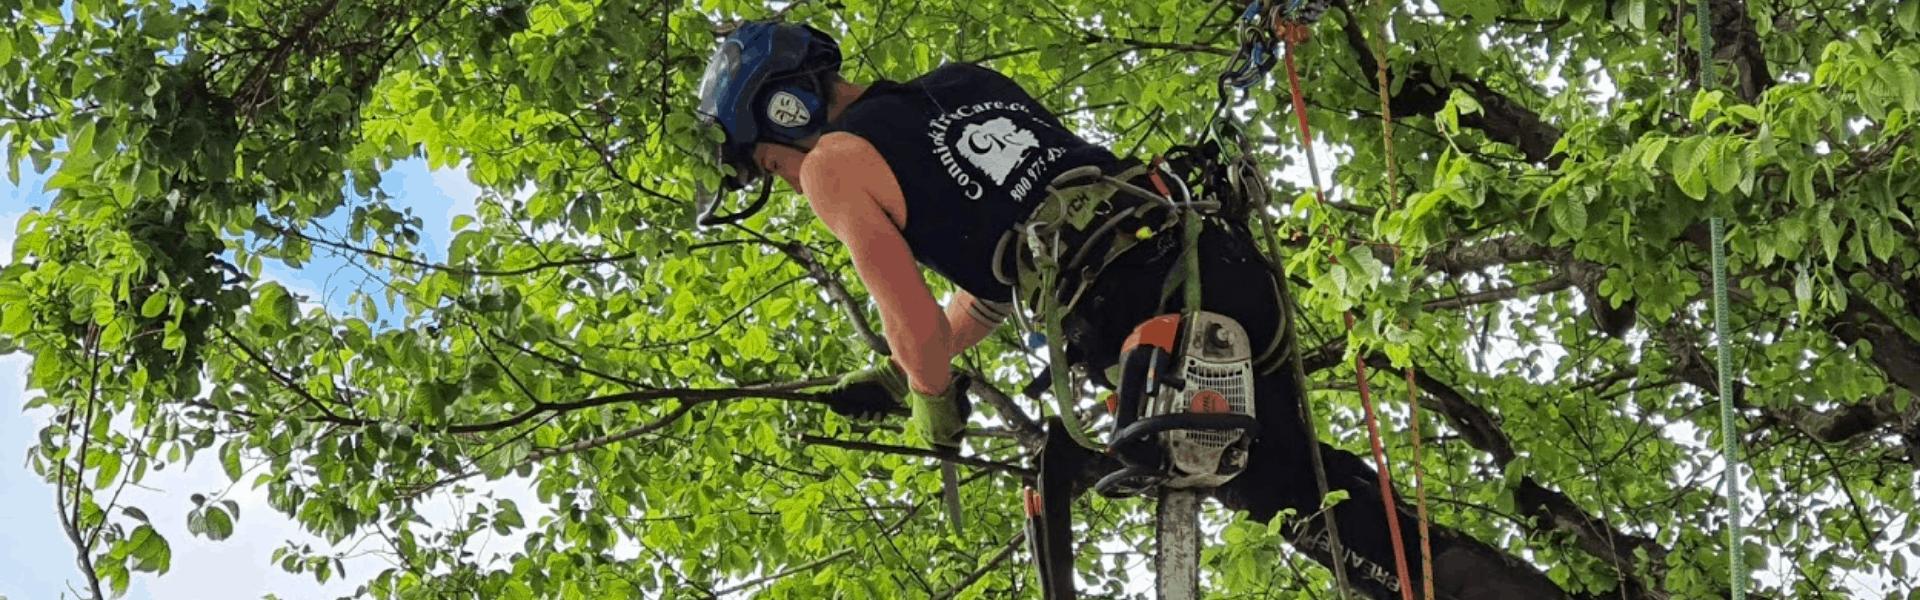 arborist salary 2018